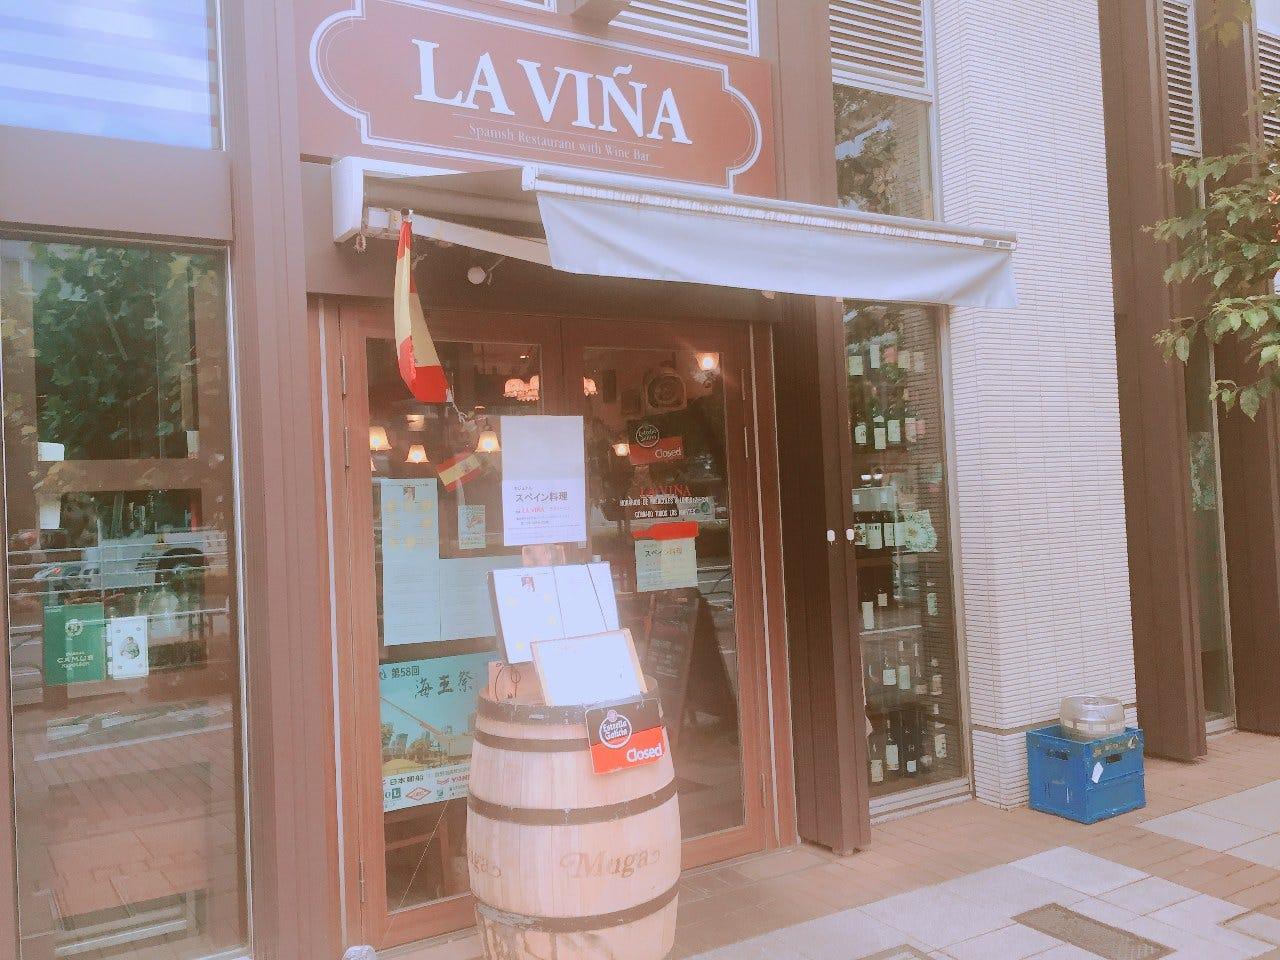 La Vina Tsukishimarabuinya Photo Tsukishima Spanish Cuisine Gurunavi Restaurant Guide